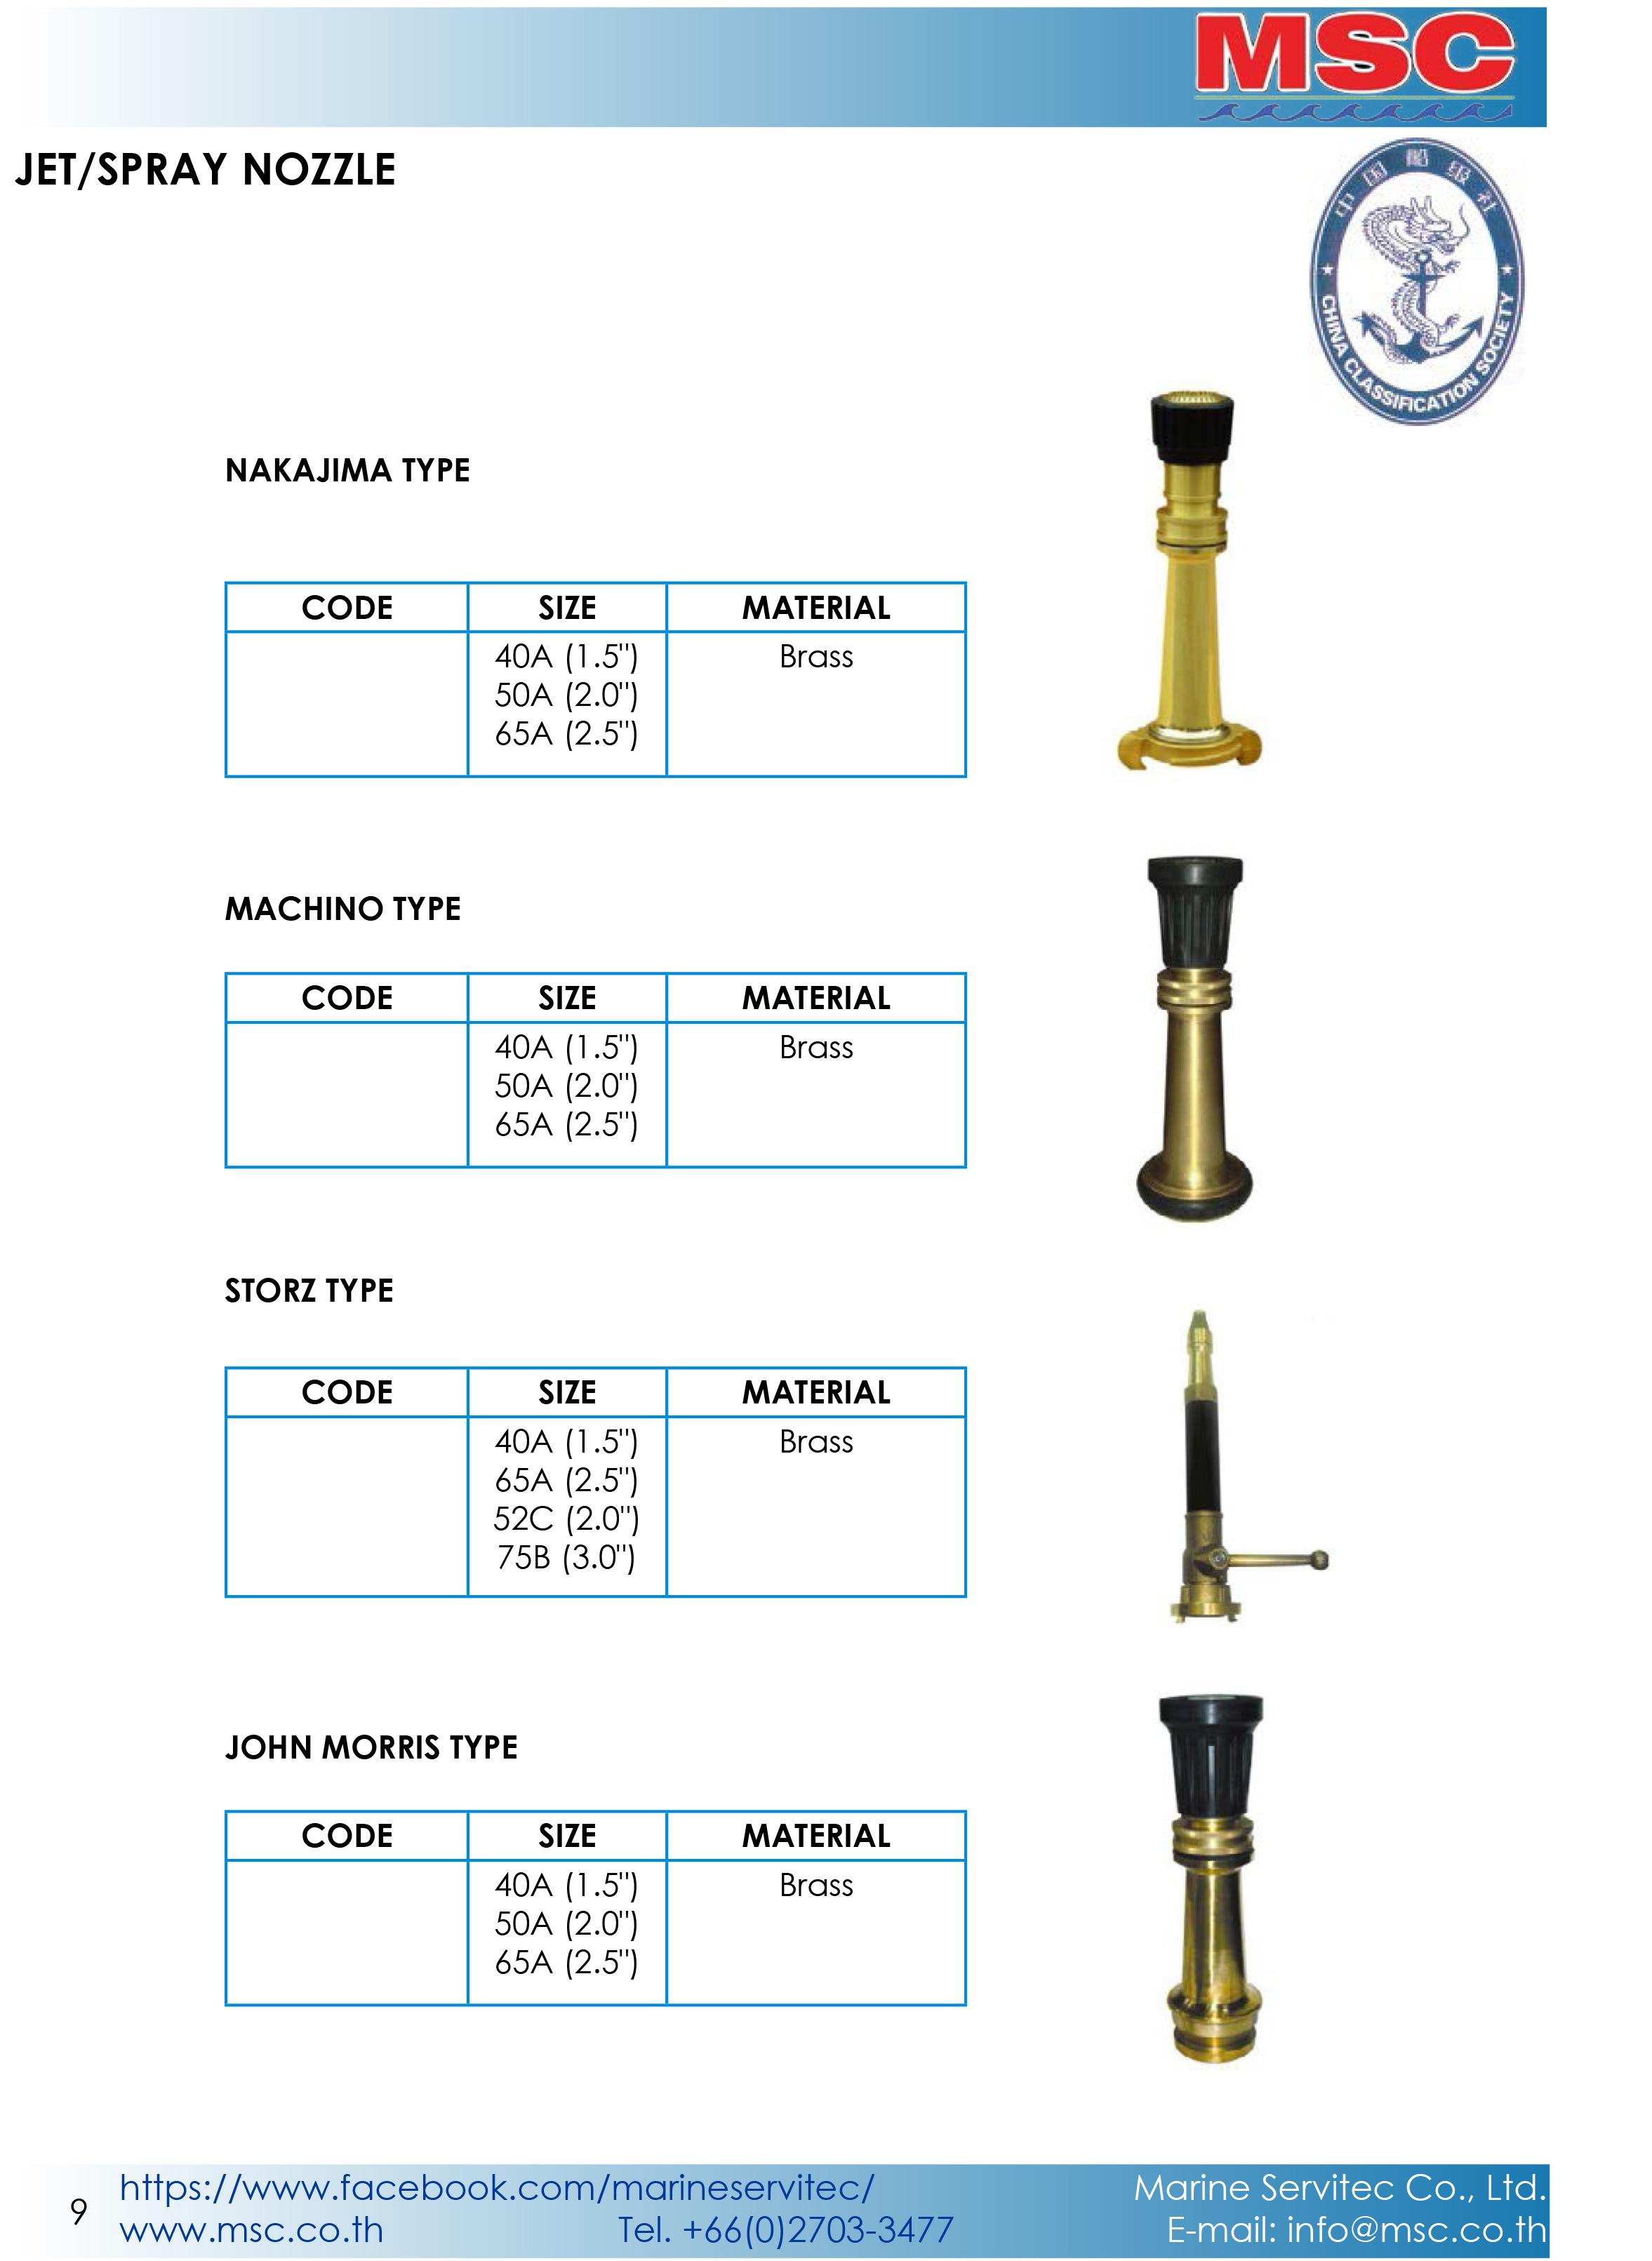 MSC - FFE Po rtable Coupling Nozzle Parts v1-2 - MSC